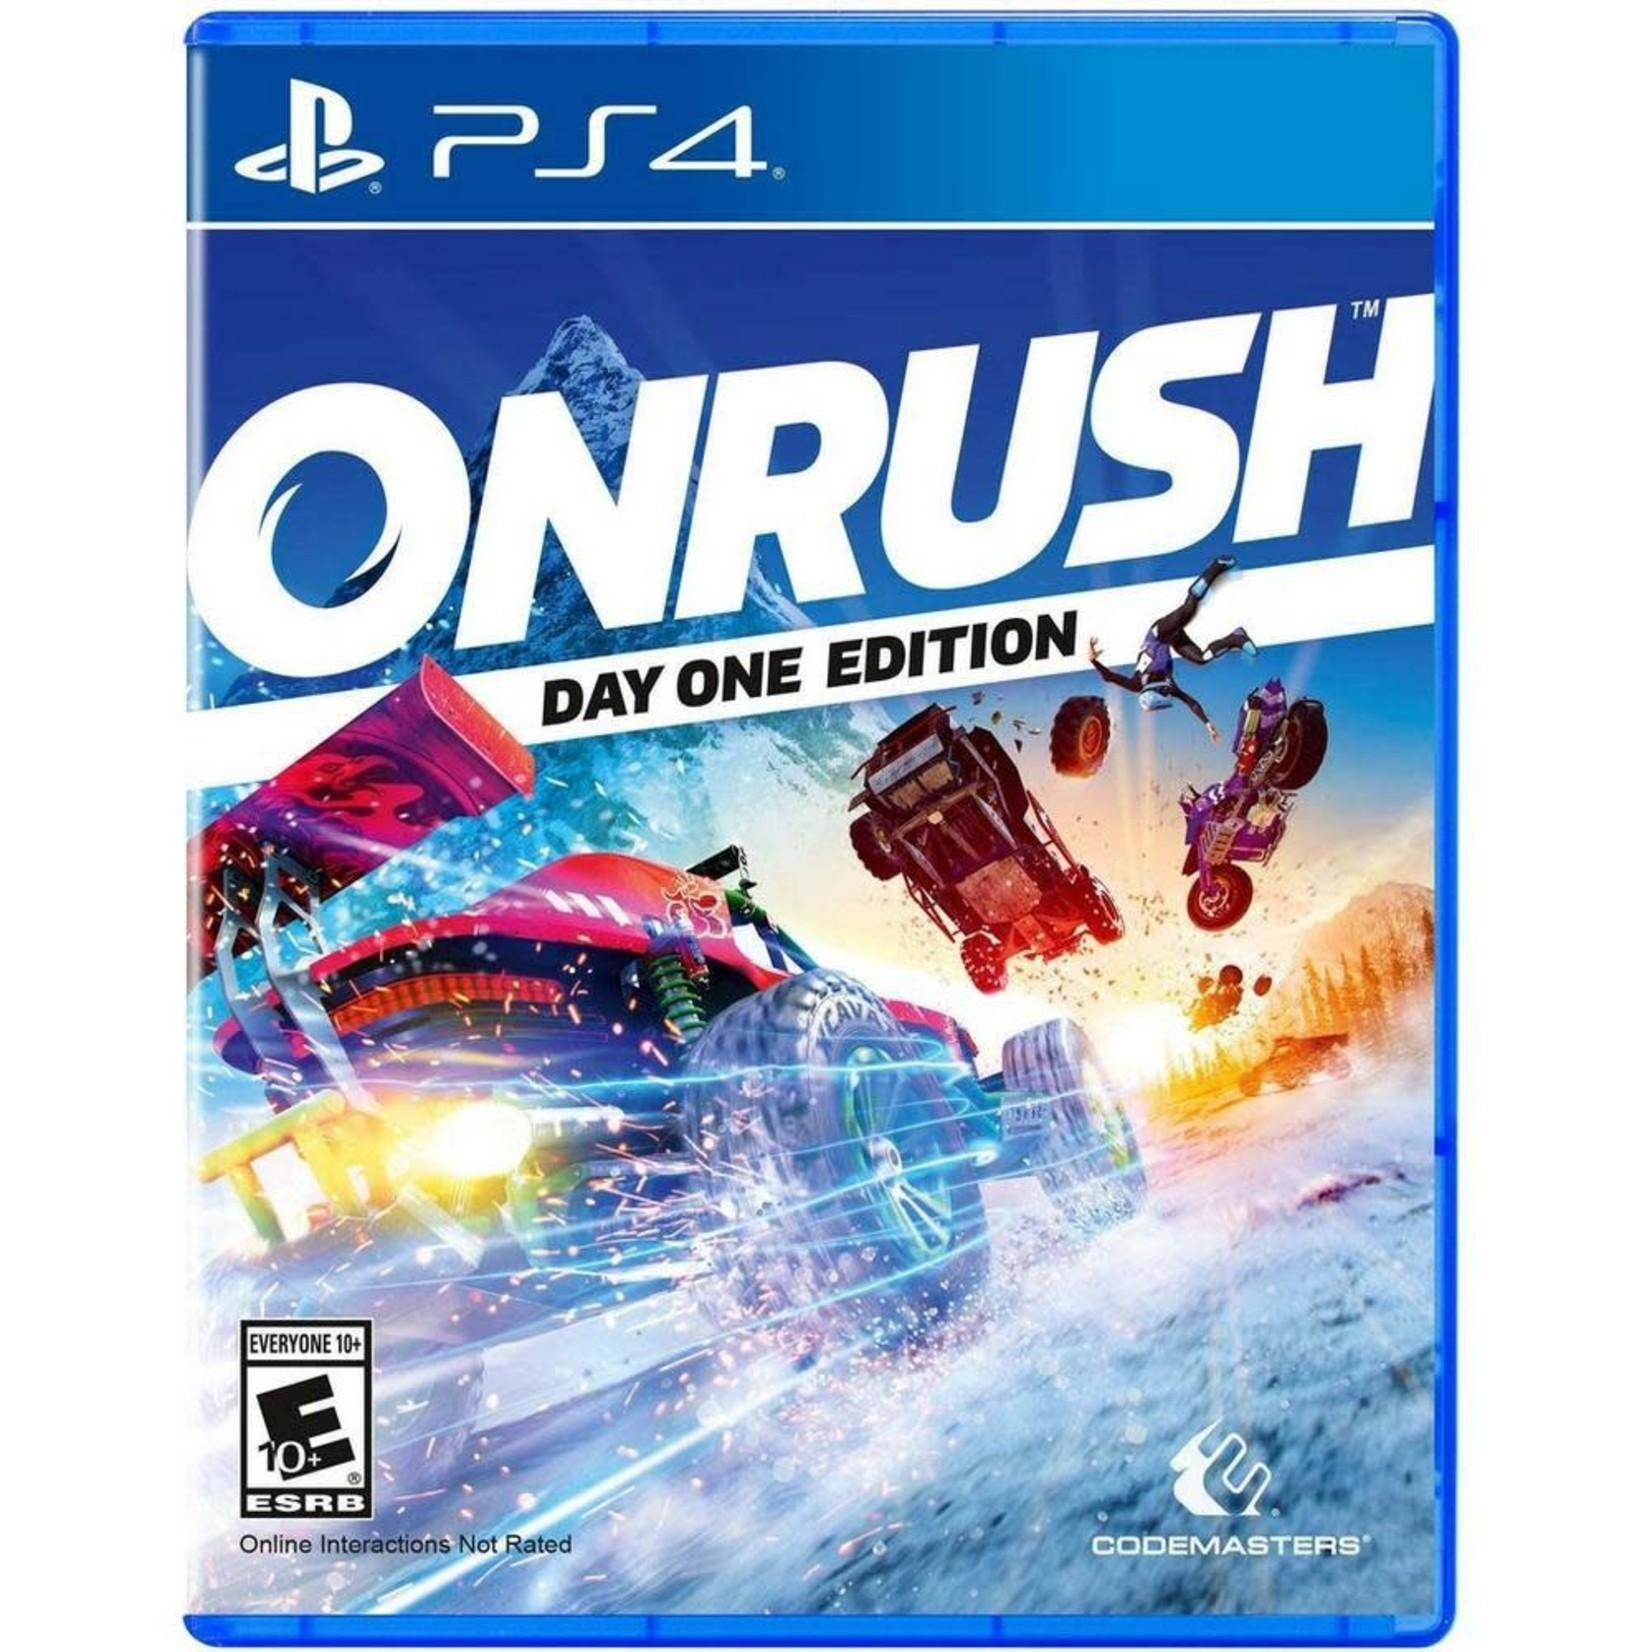 PS4-Onrush